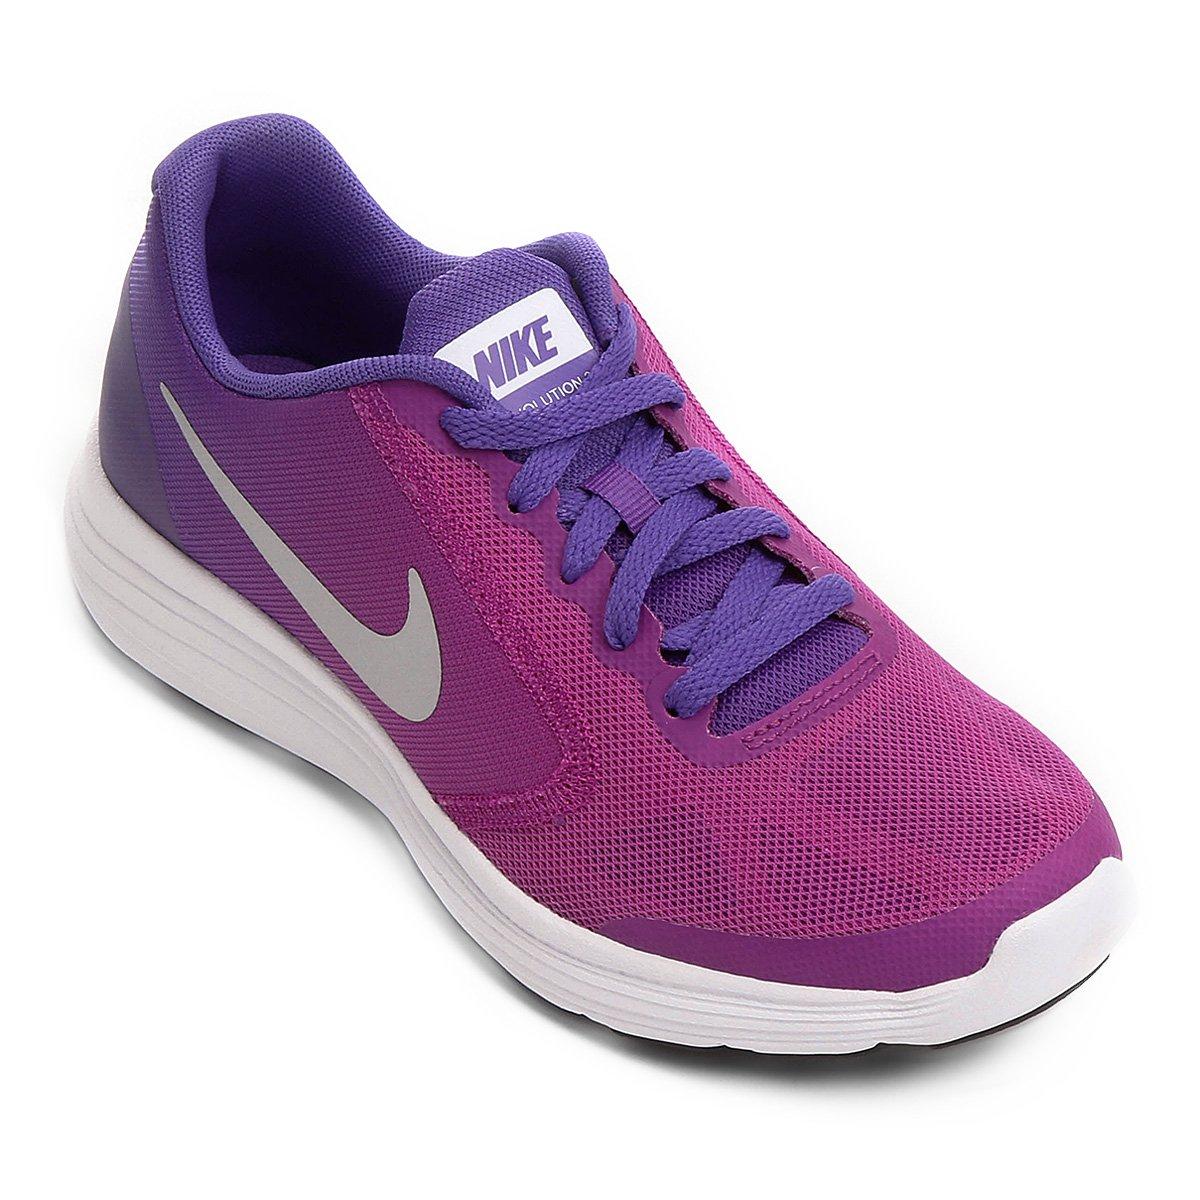 cca40dccd8d Tênis Infantil Nike Revolution 3 (GS) 819416-503 Violeta